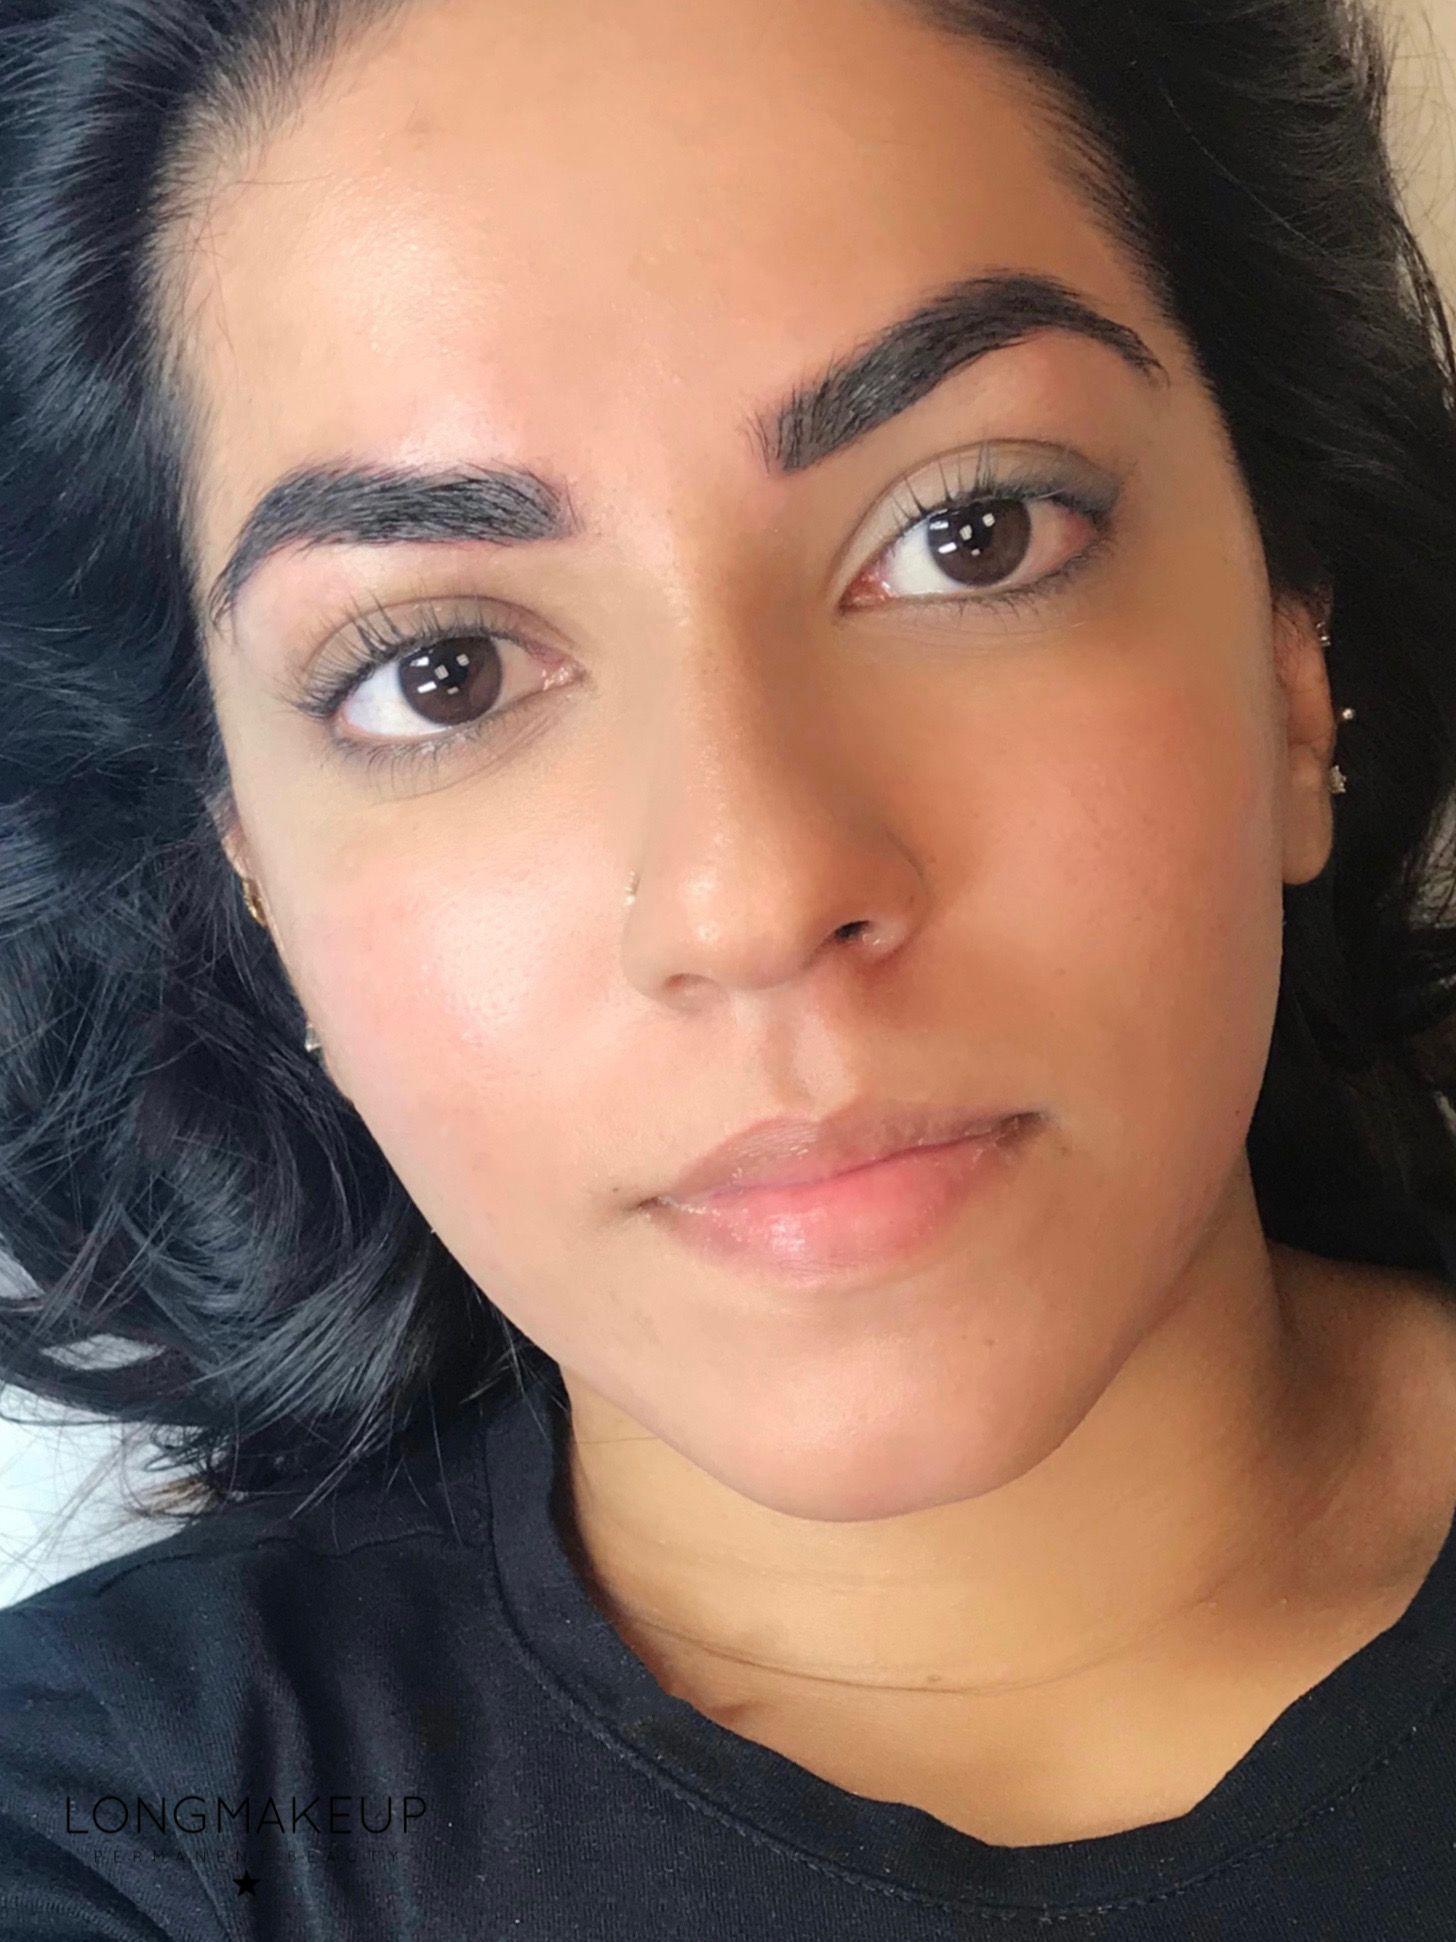 Eyebrows tattoo for dark brunette